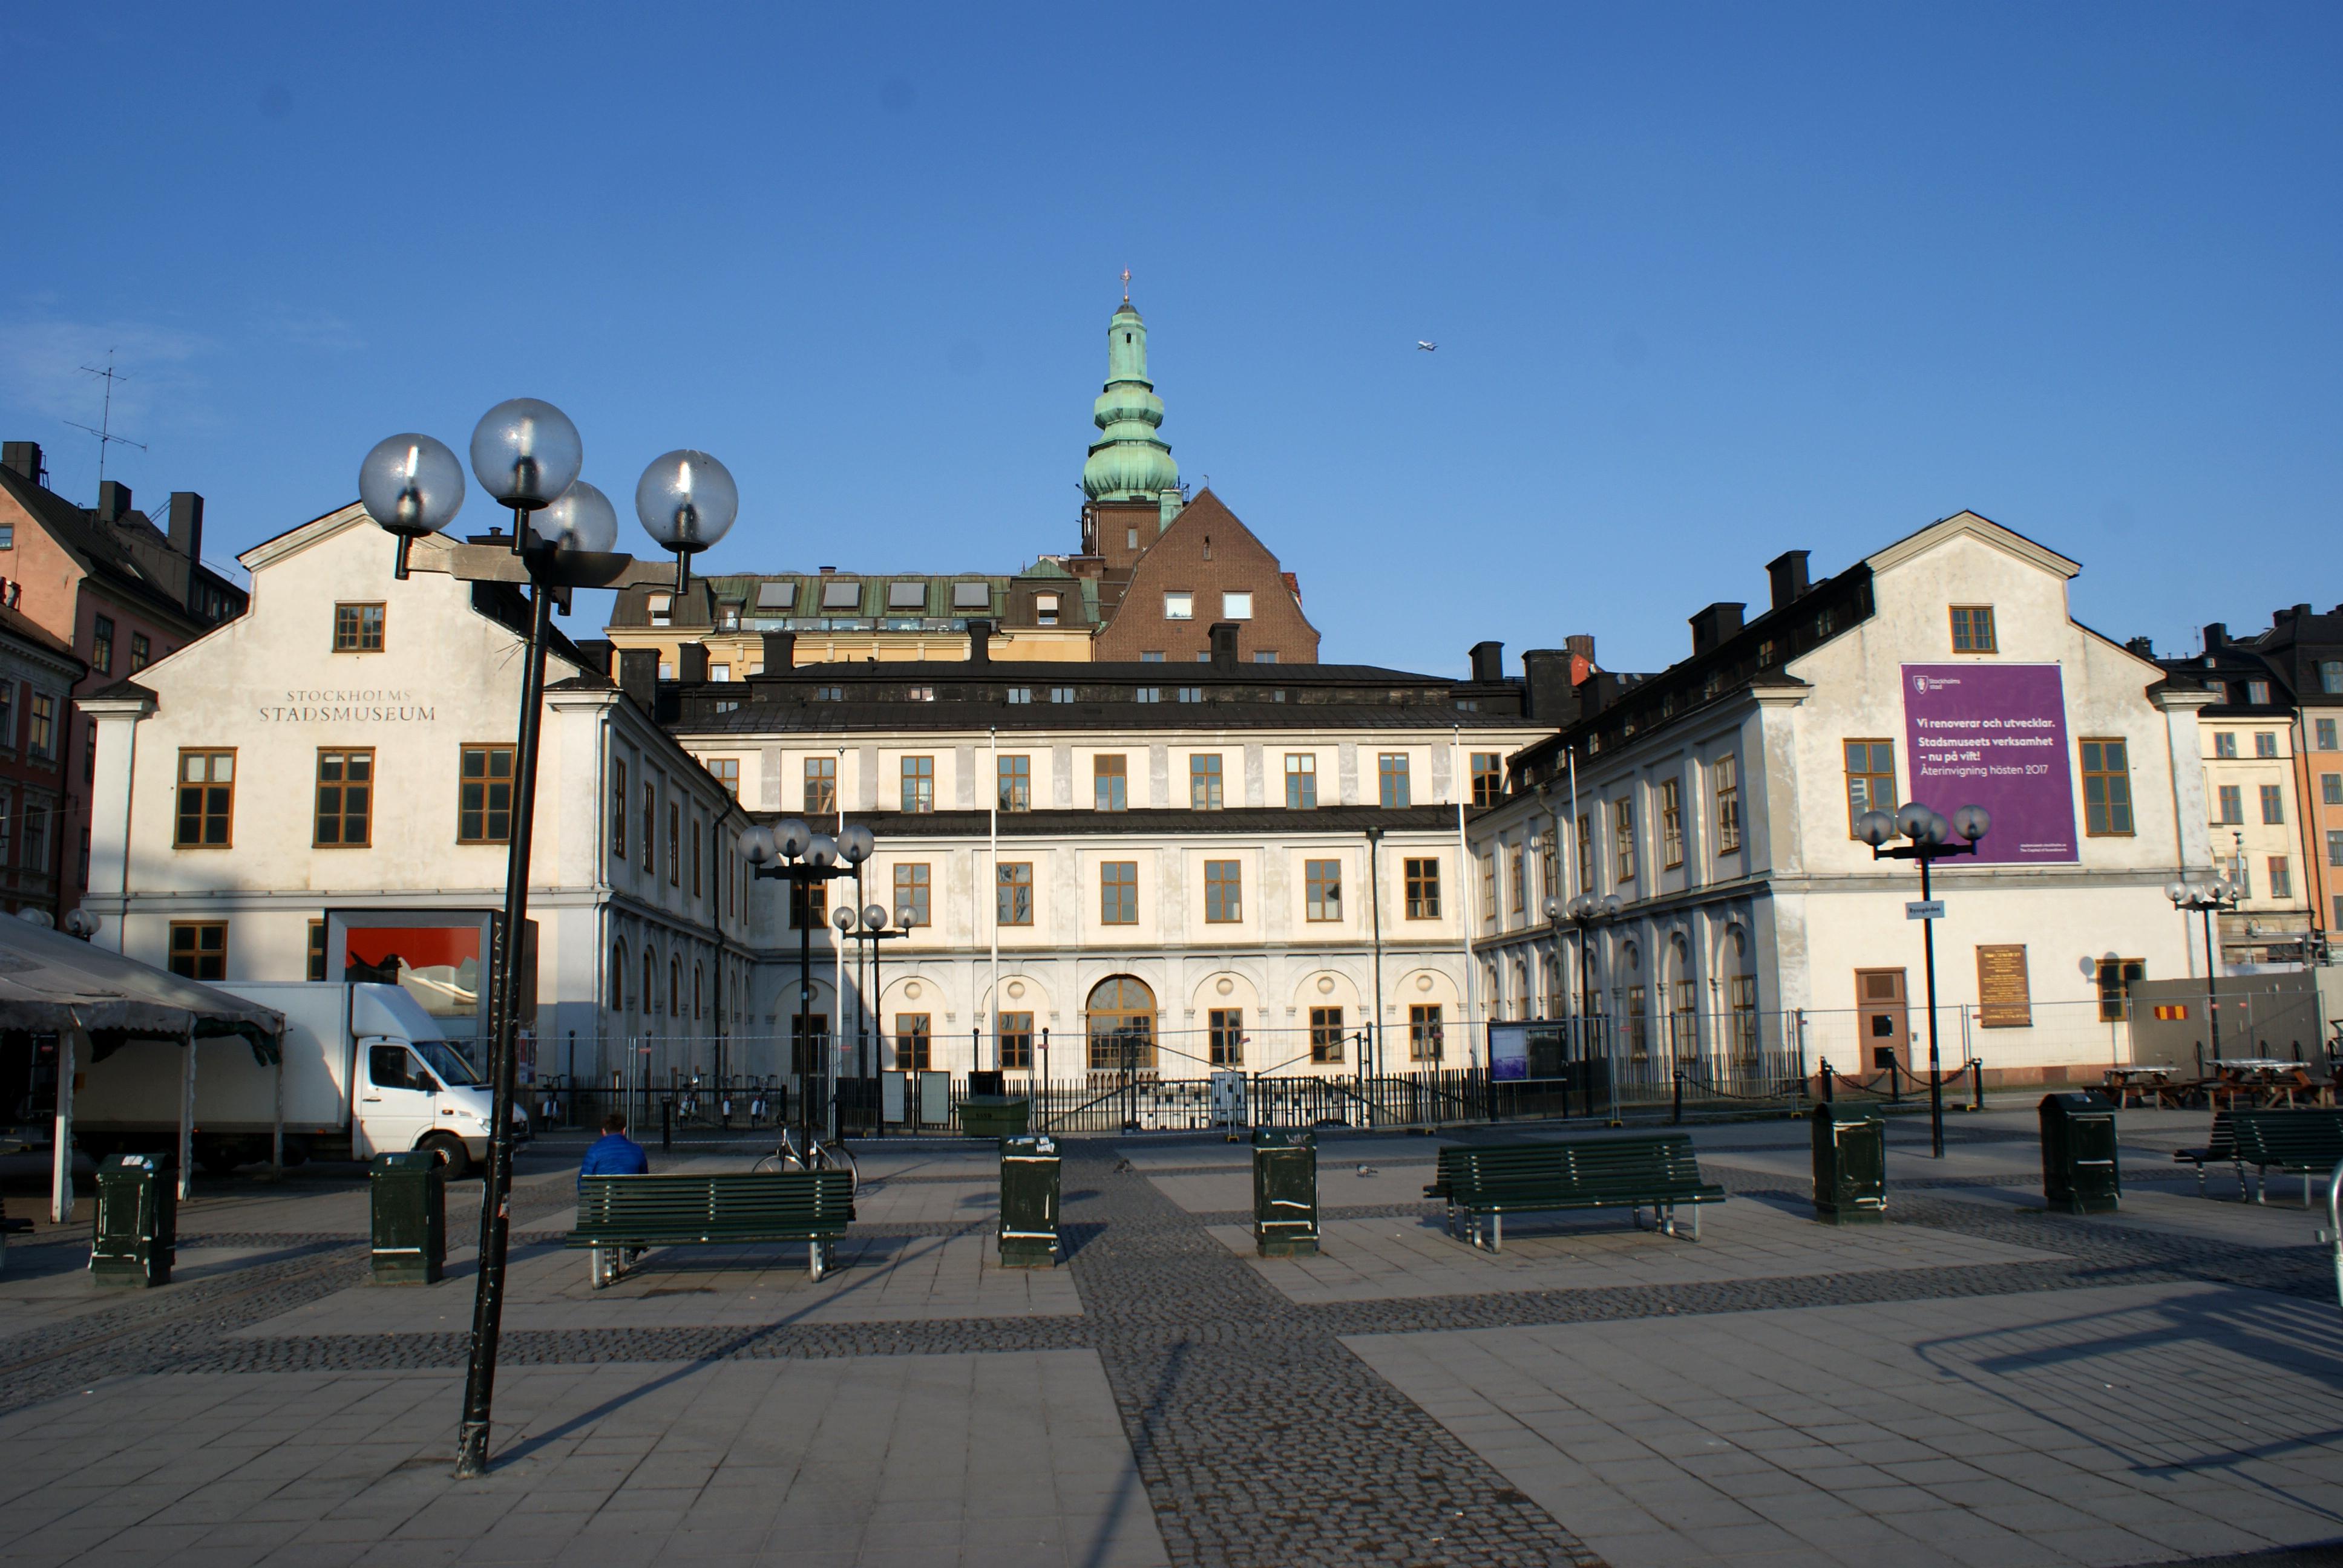 Stockholms Stadsmuseum